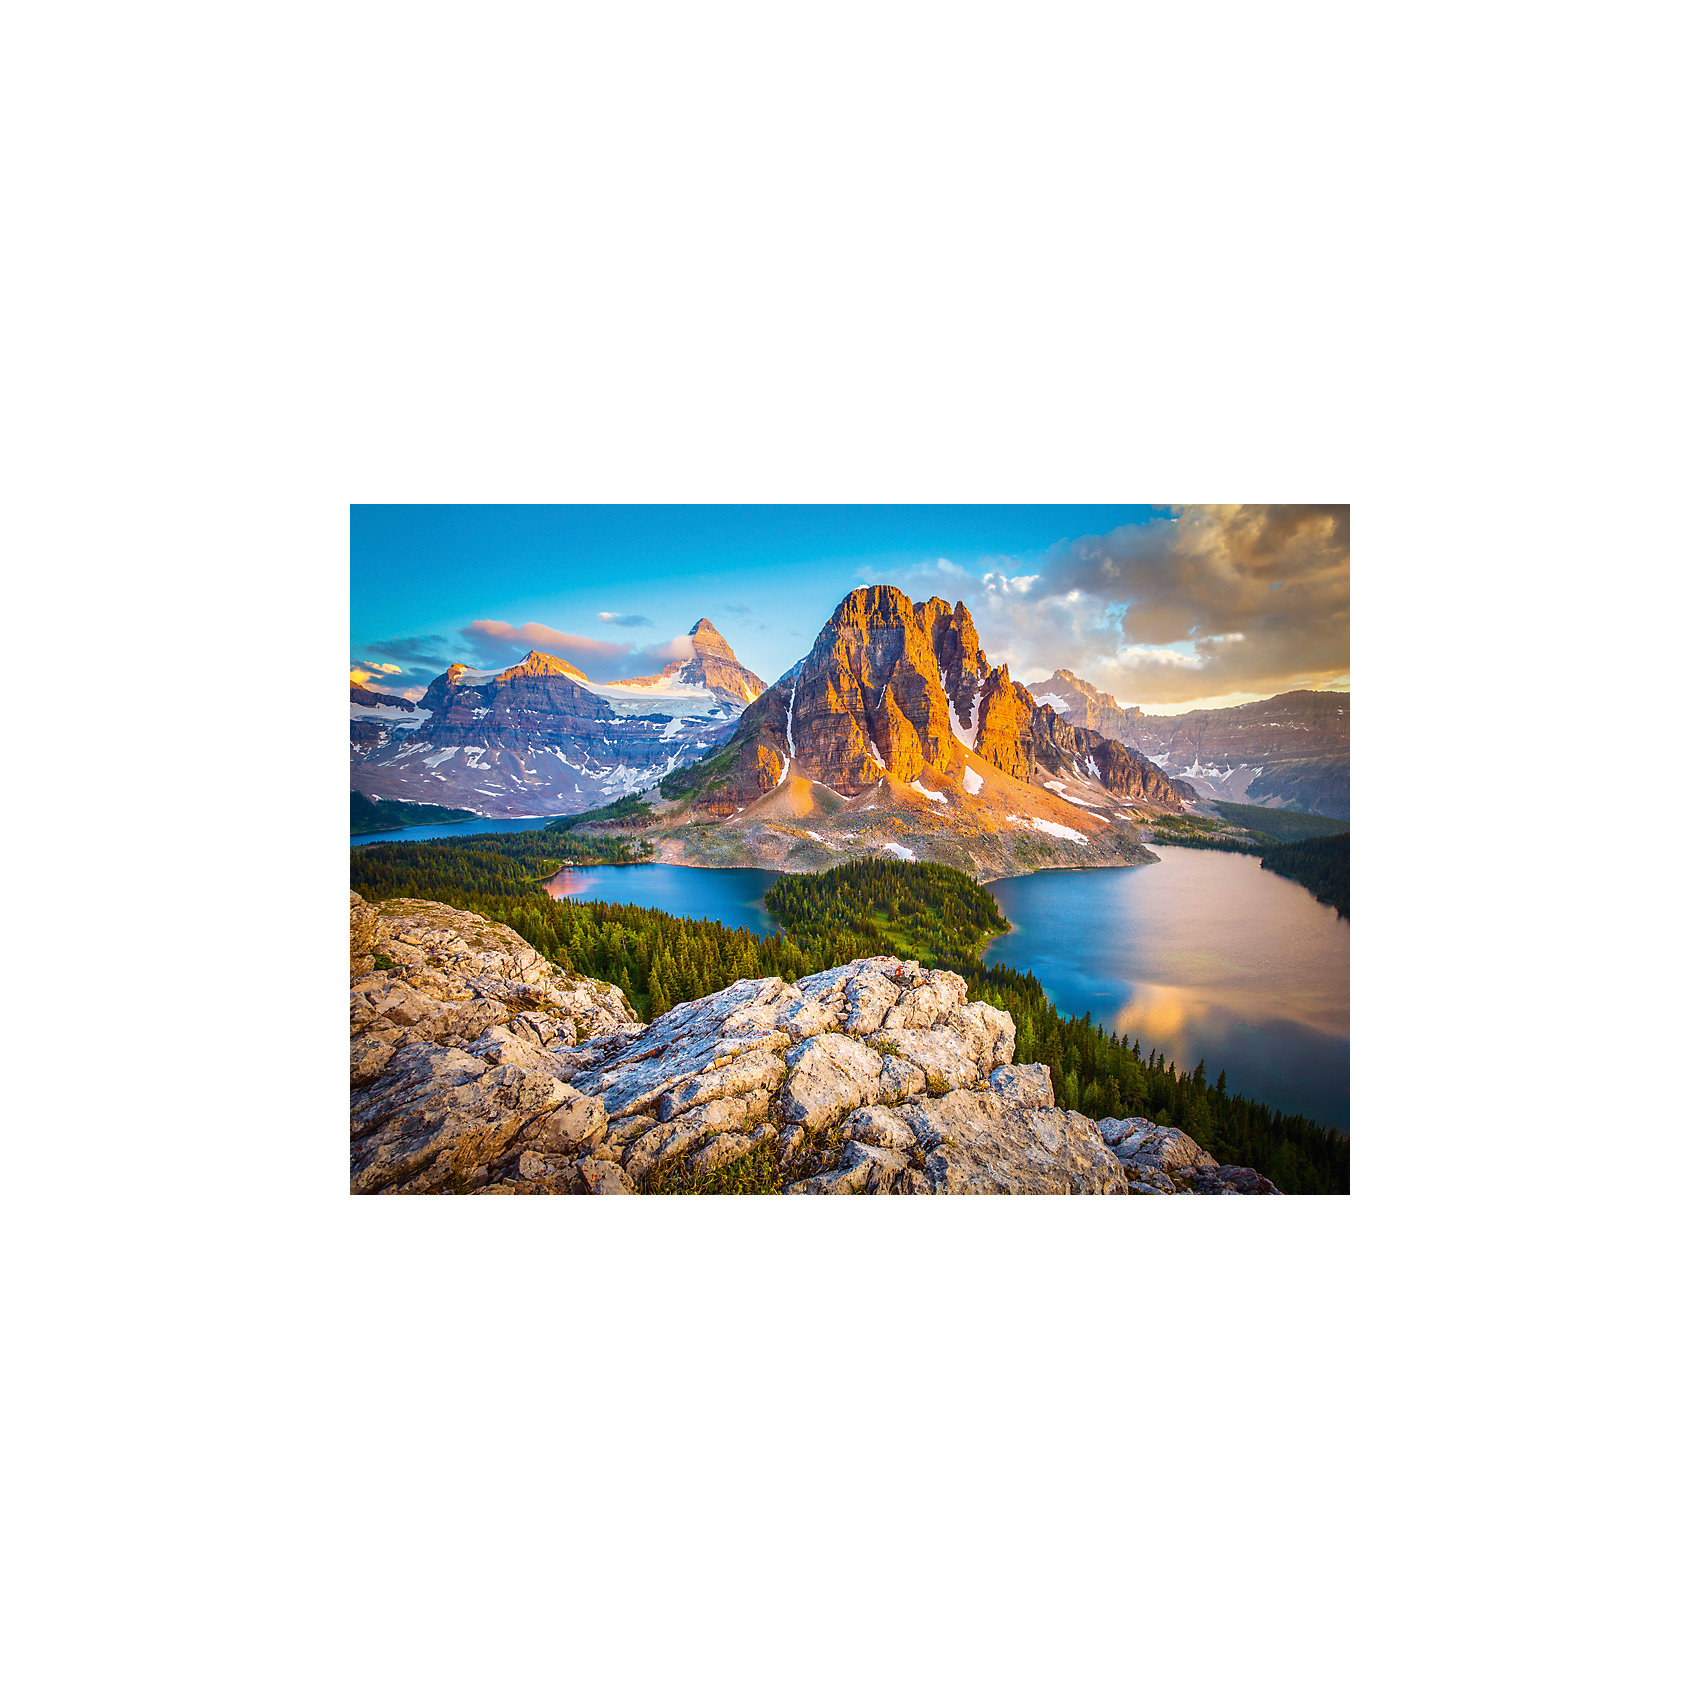 Пазл Национальный парк, Канада, 1000 деталей, Castorland<br><br>Ширина мм: 350<br>Глубина мм: 50<br>Высота мм: 250<br>Вес г: 500<br>Возраст от месяцев: 168<br>Возраст до месяцев: 1188<br>Пол: Унисекс<br>Возраст: Детский<br>SKU: 4879216